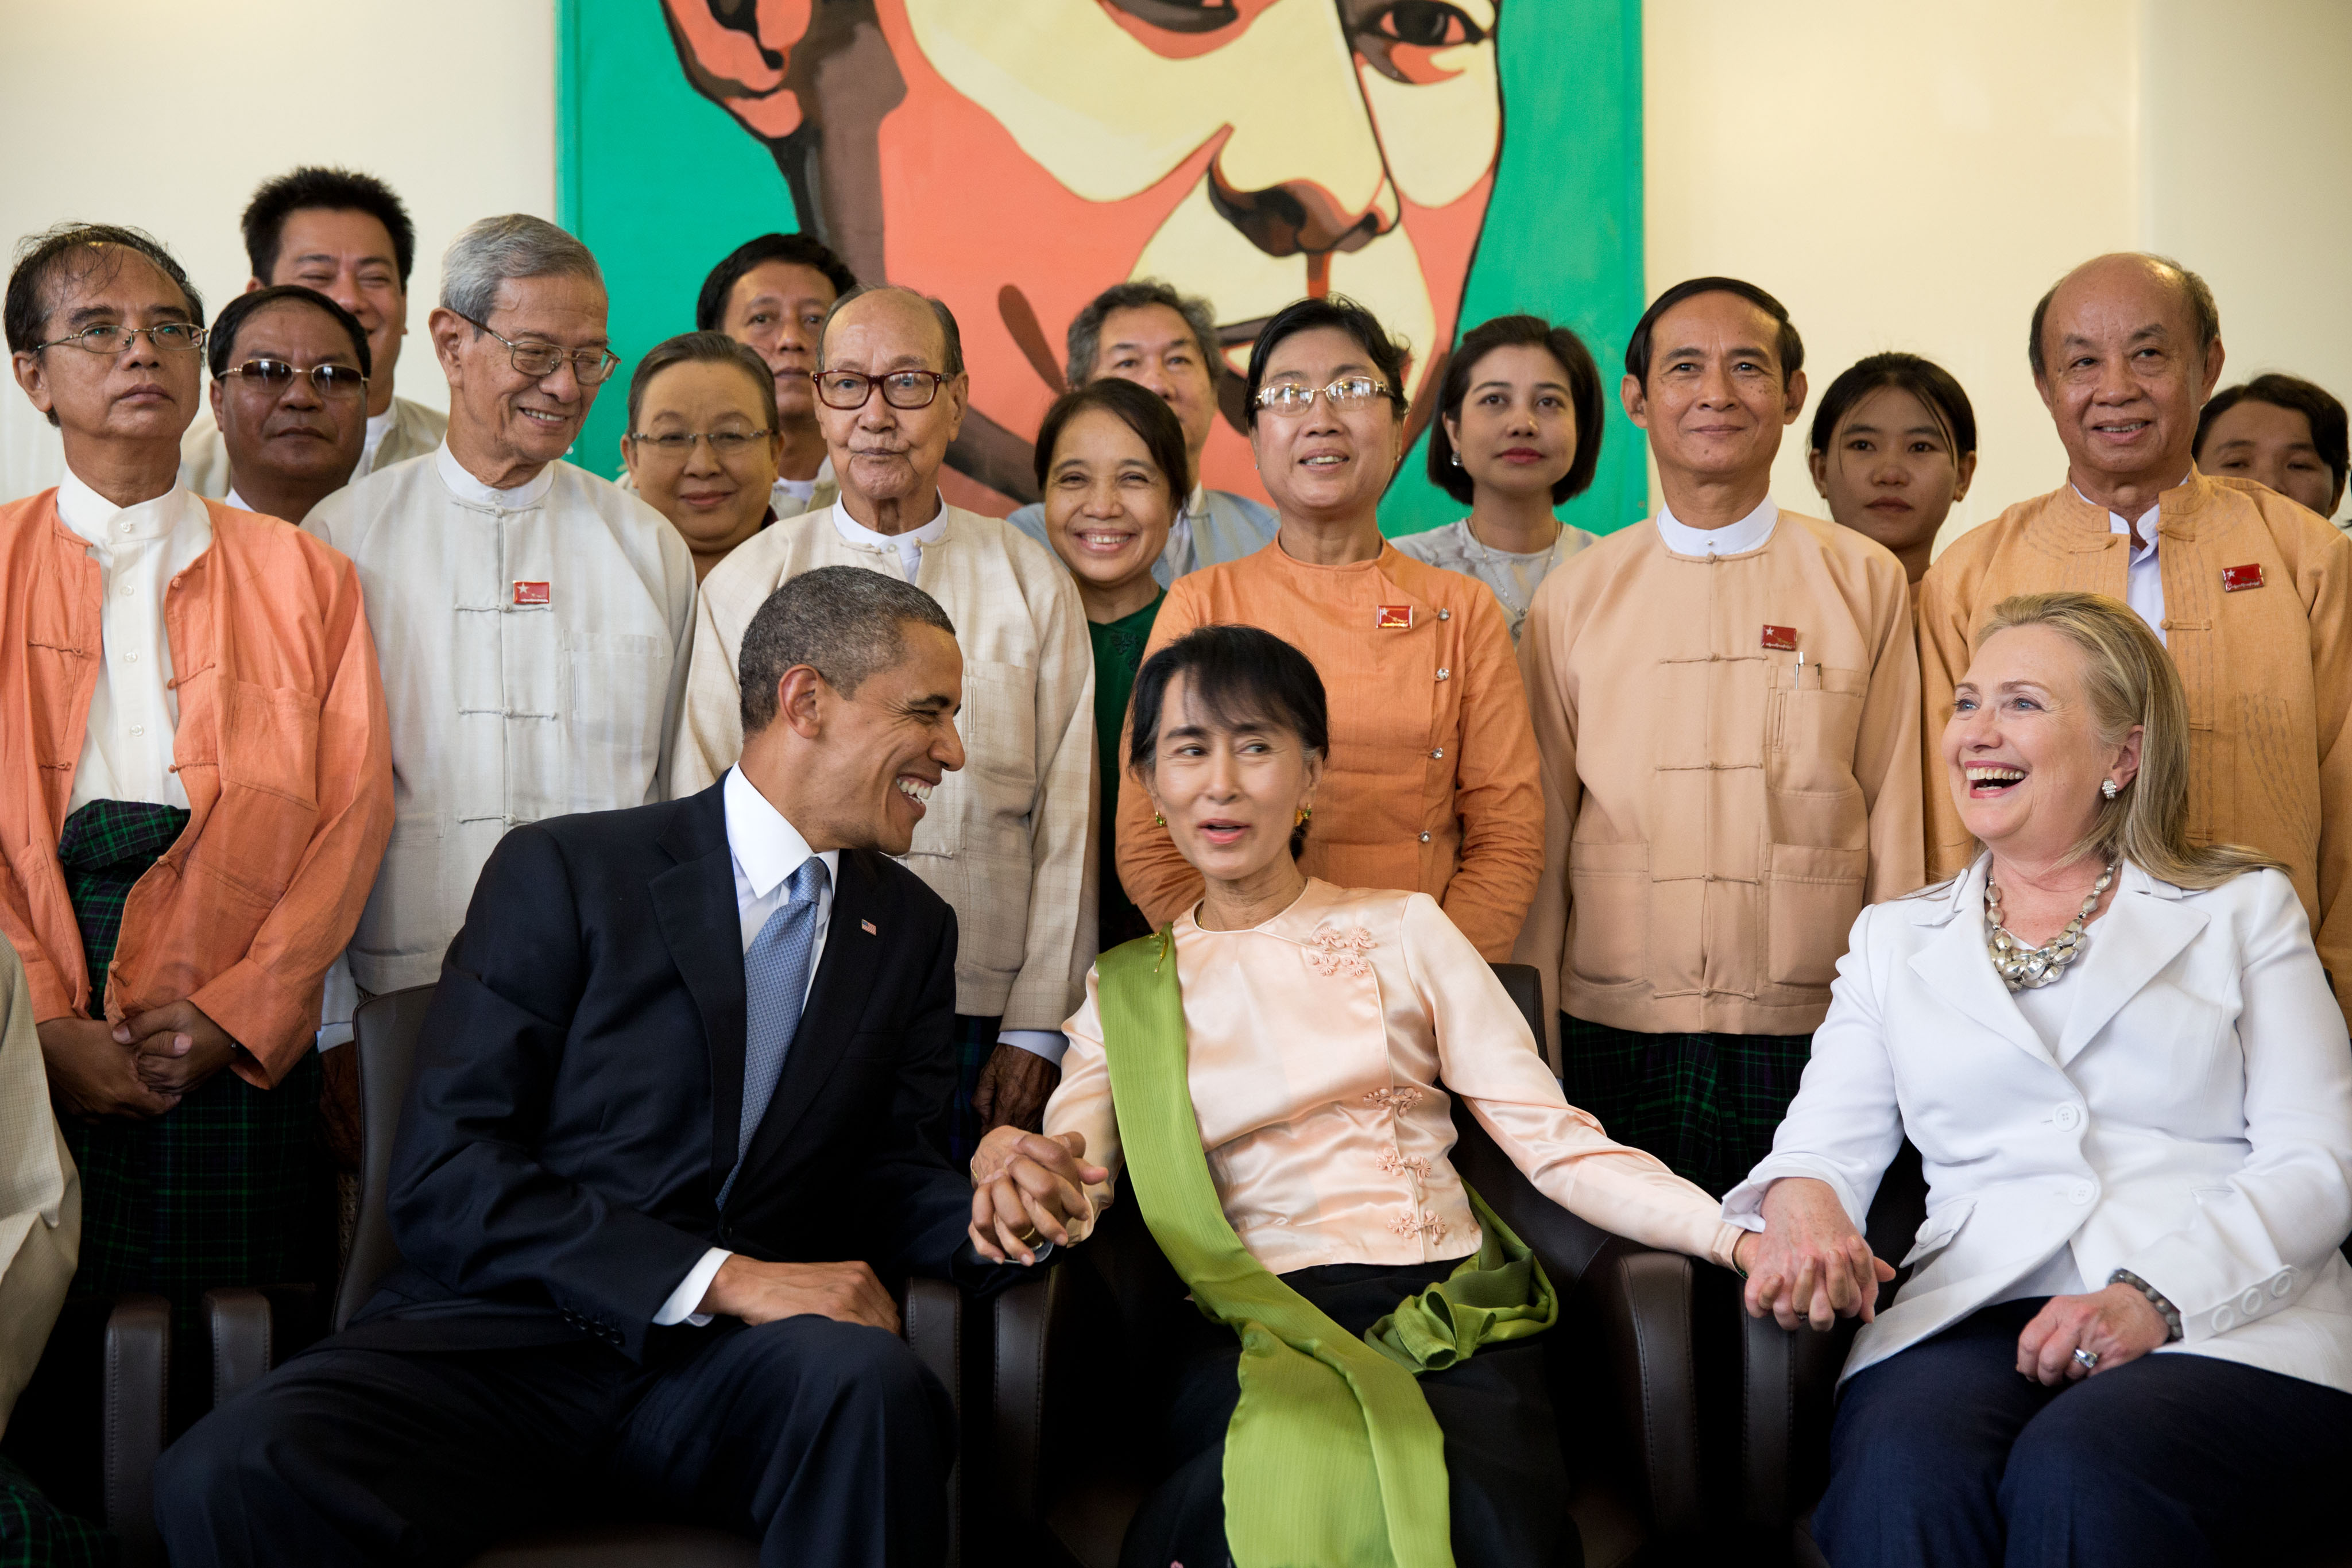 Obama and Clinton with Aung San Suu Kyi